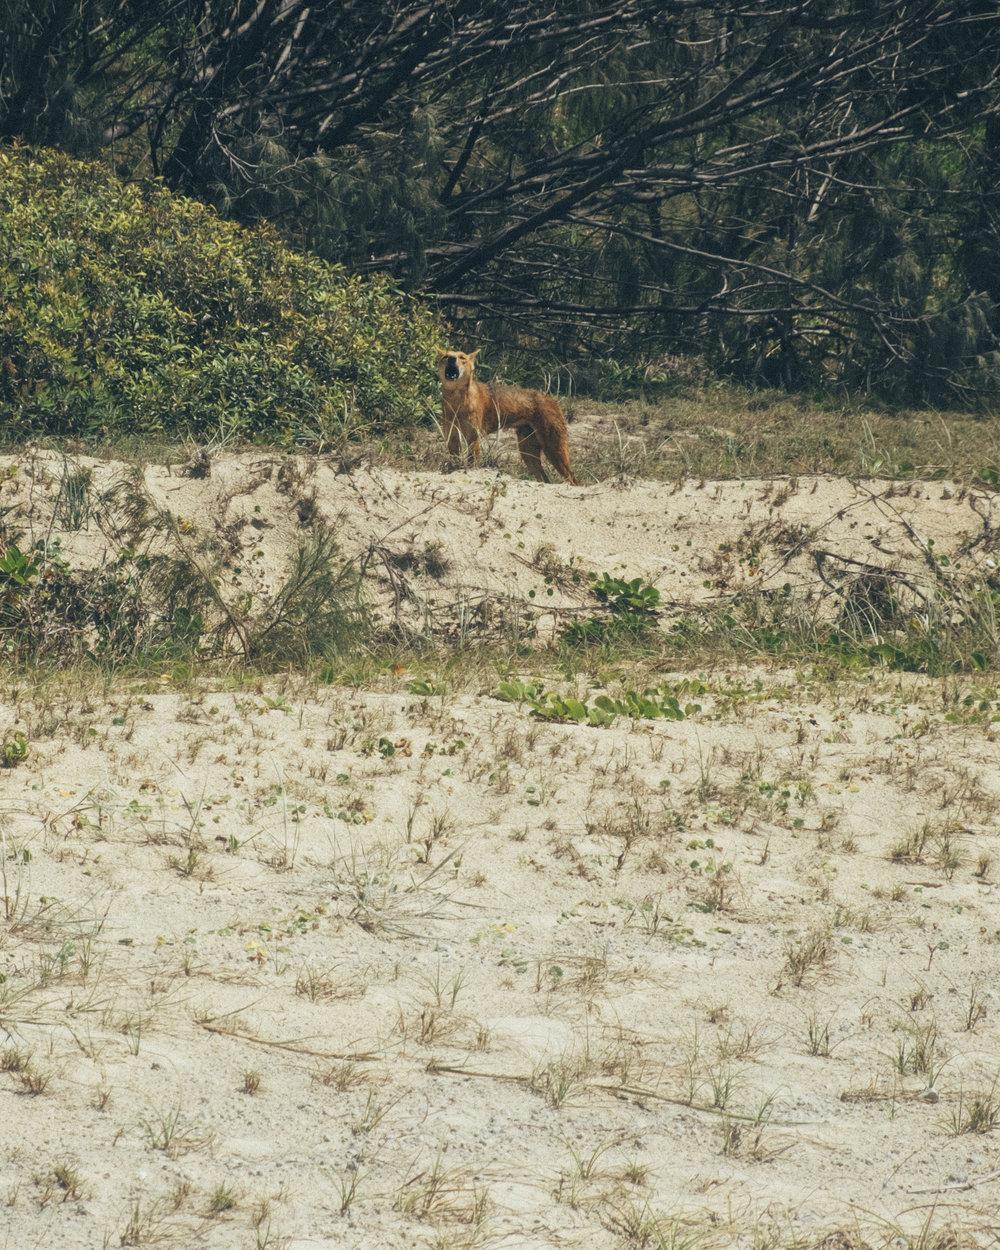 Dingo Sighting on Fraser Island